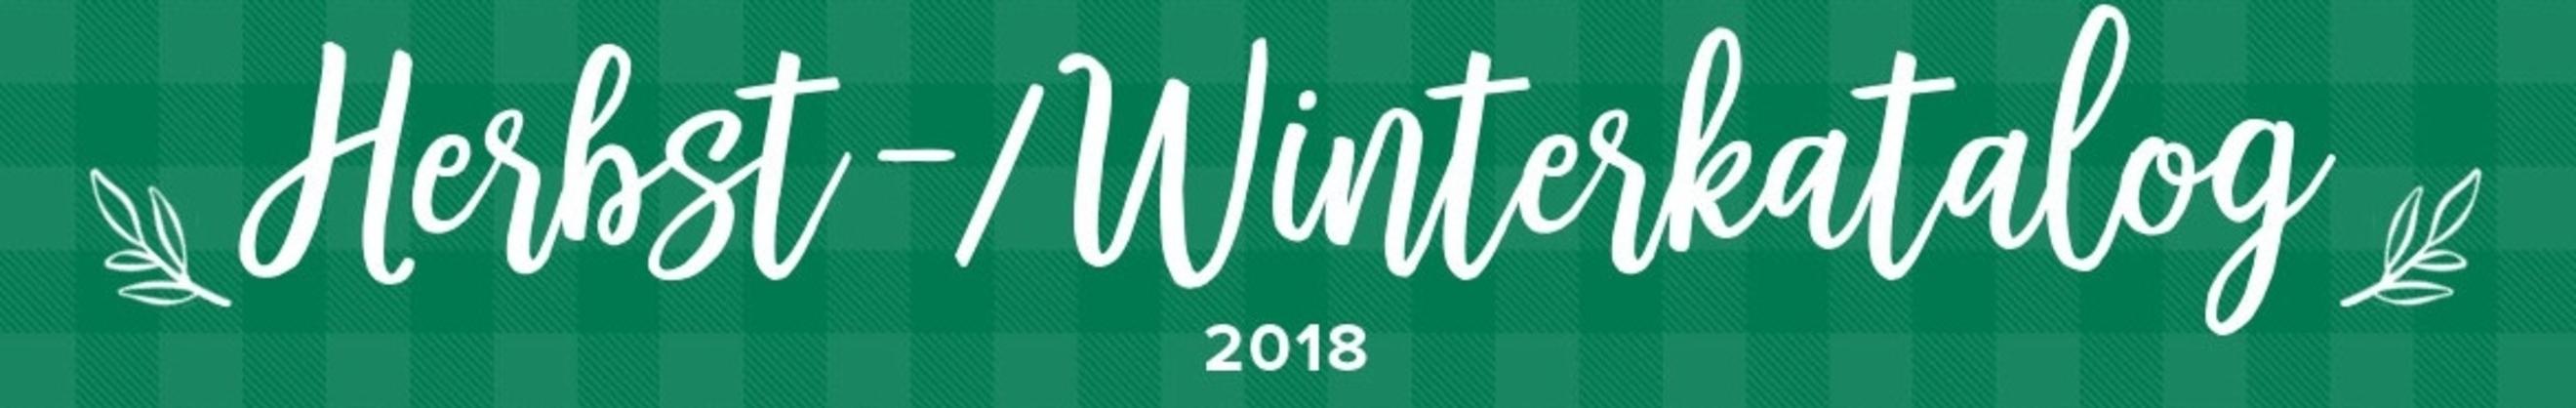 Herbst-/Winterkatalog 2018